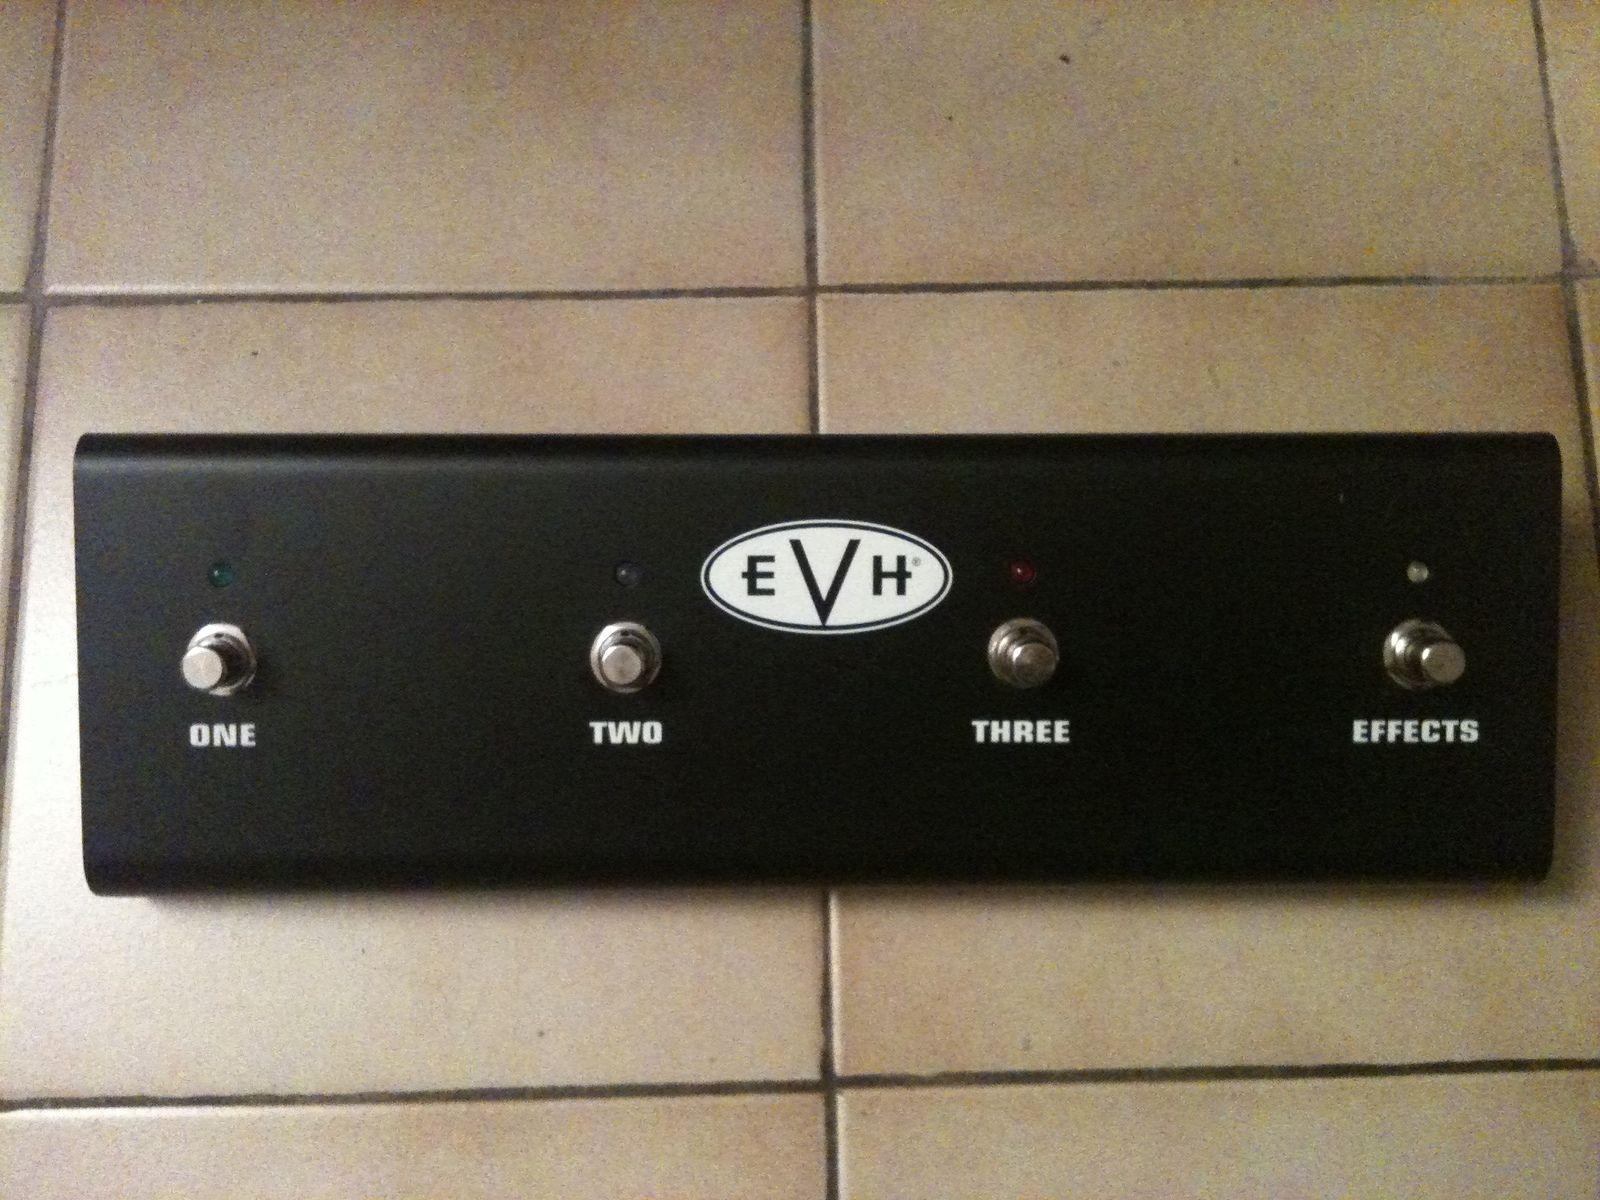 evh 5150 iii 100w head image 215204 audiofanzine. Black Bedroom Furniture Sets. Home Design Ideas